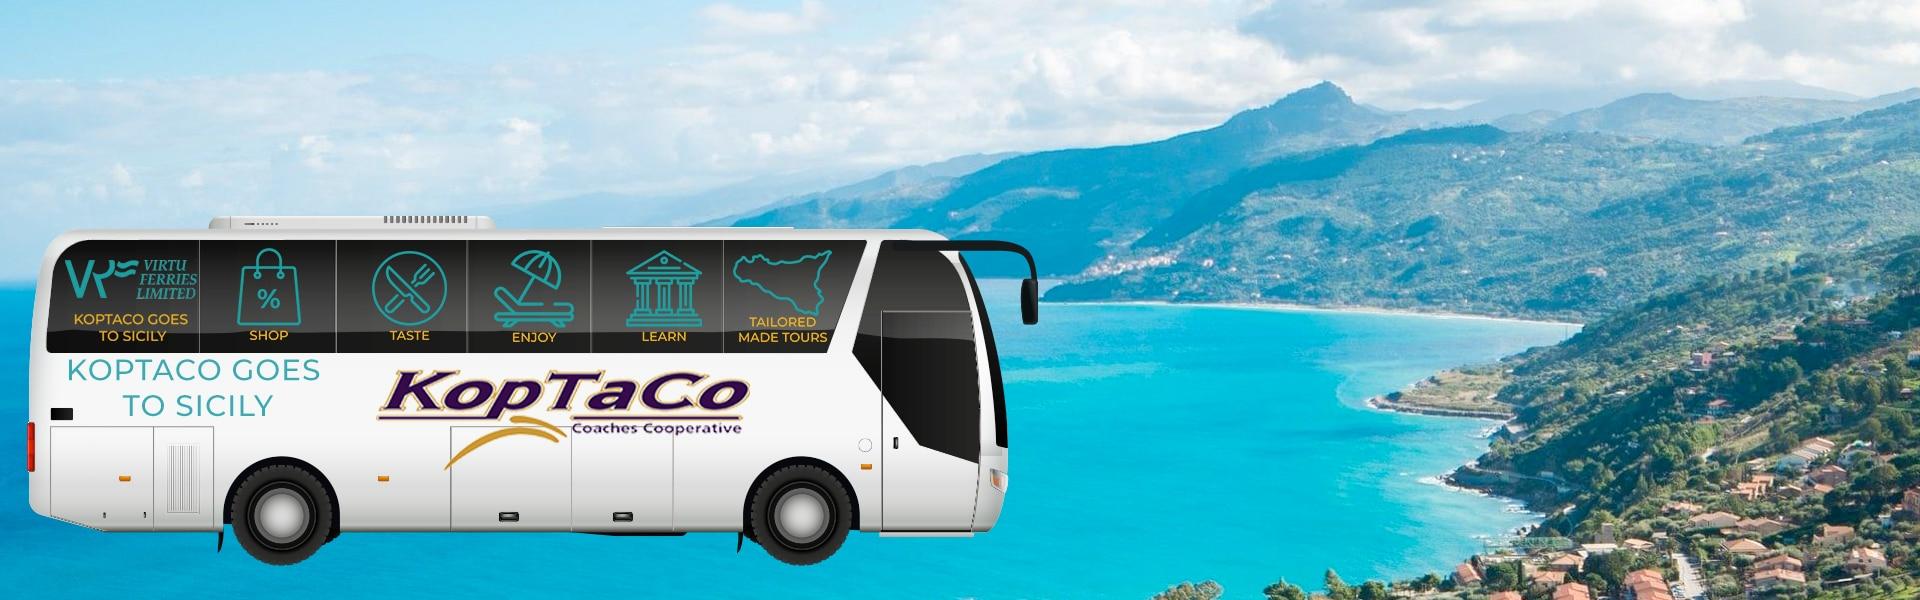 koptaco-goes-to-sicily-tour-bus-catamara-virtu-ferries-malta-italy-transport-boat